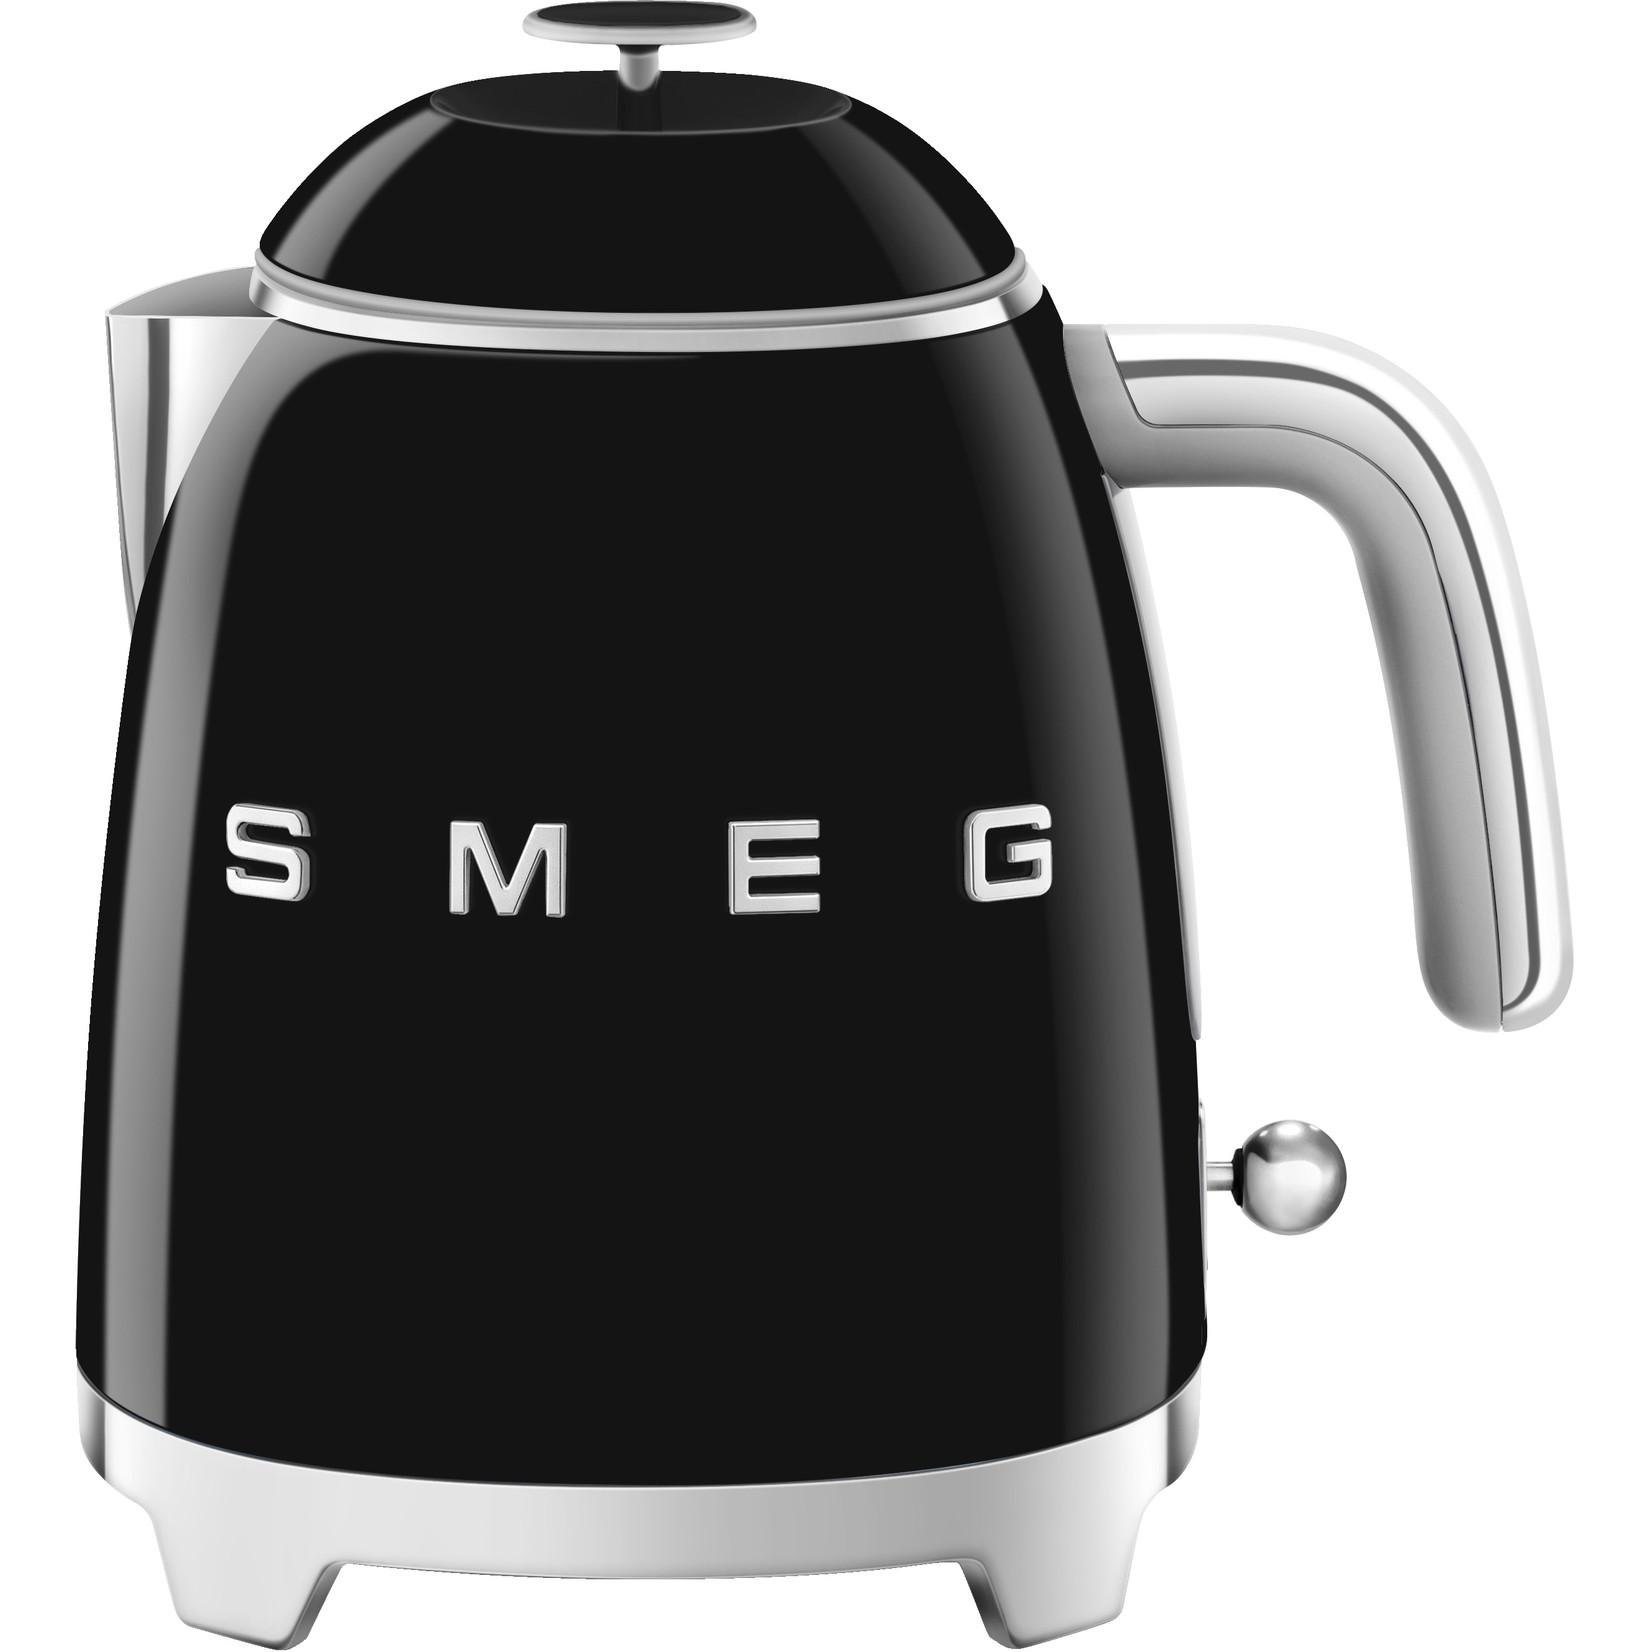 Smeg Smeg waterkoker 0,8 liter, zwart